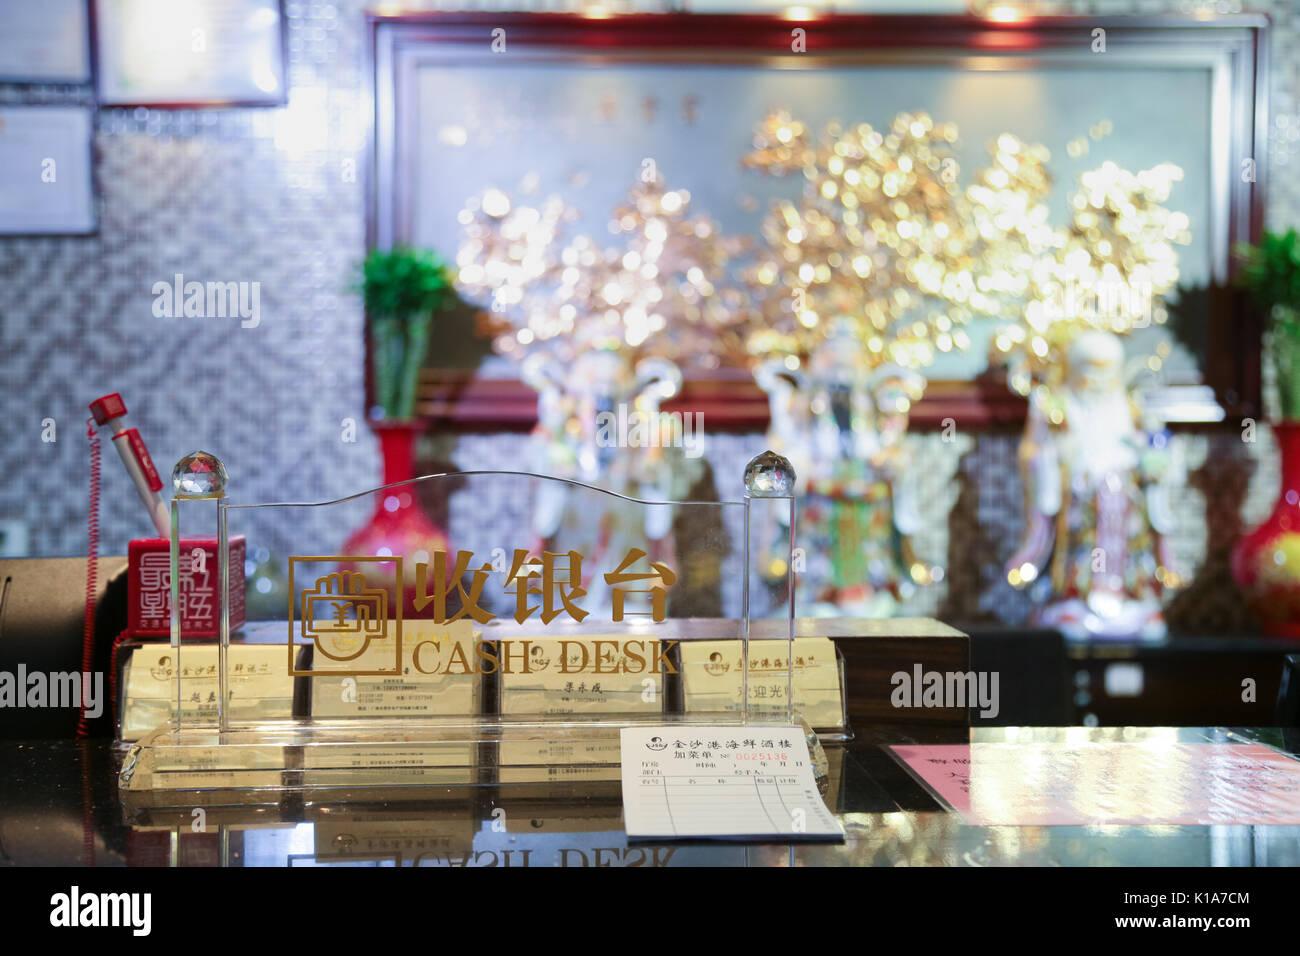 cashier counter of a chinese restaurant at guangzhou guangdong china